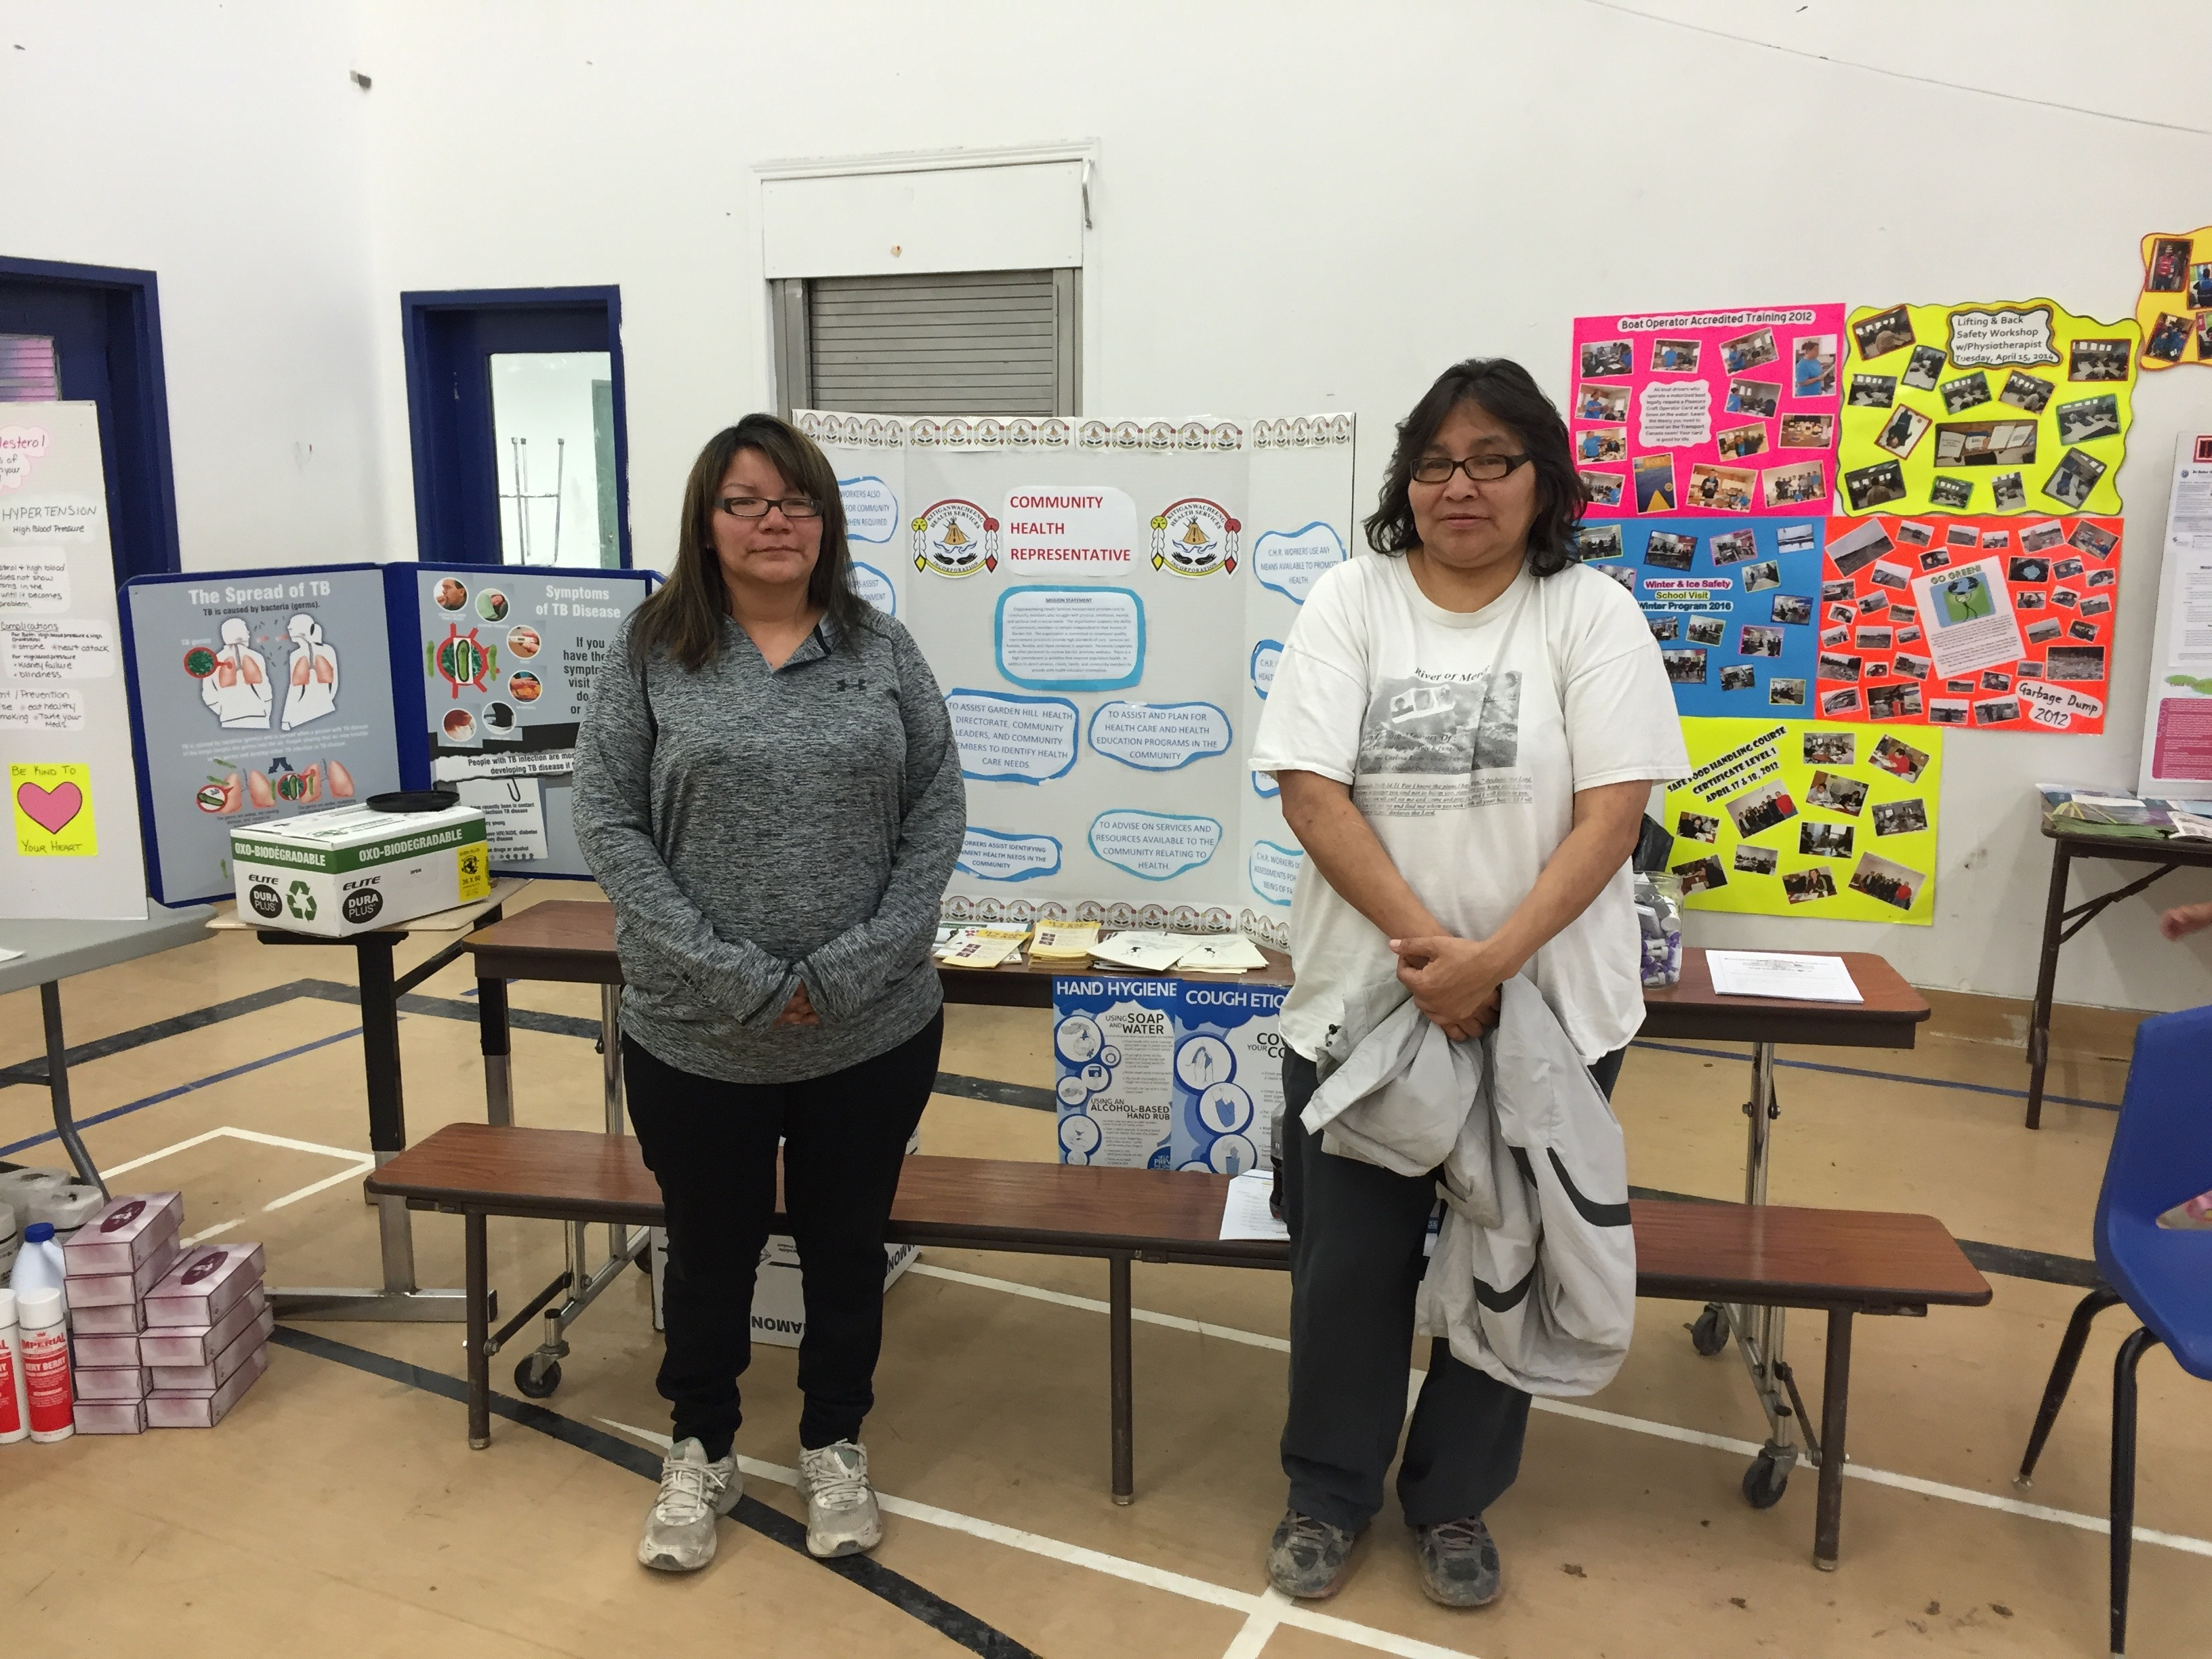 Community Health Representatives